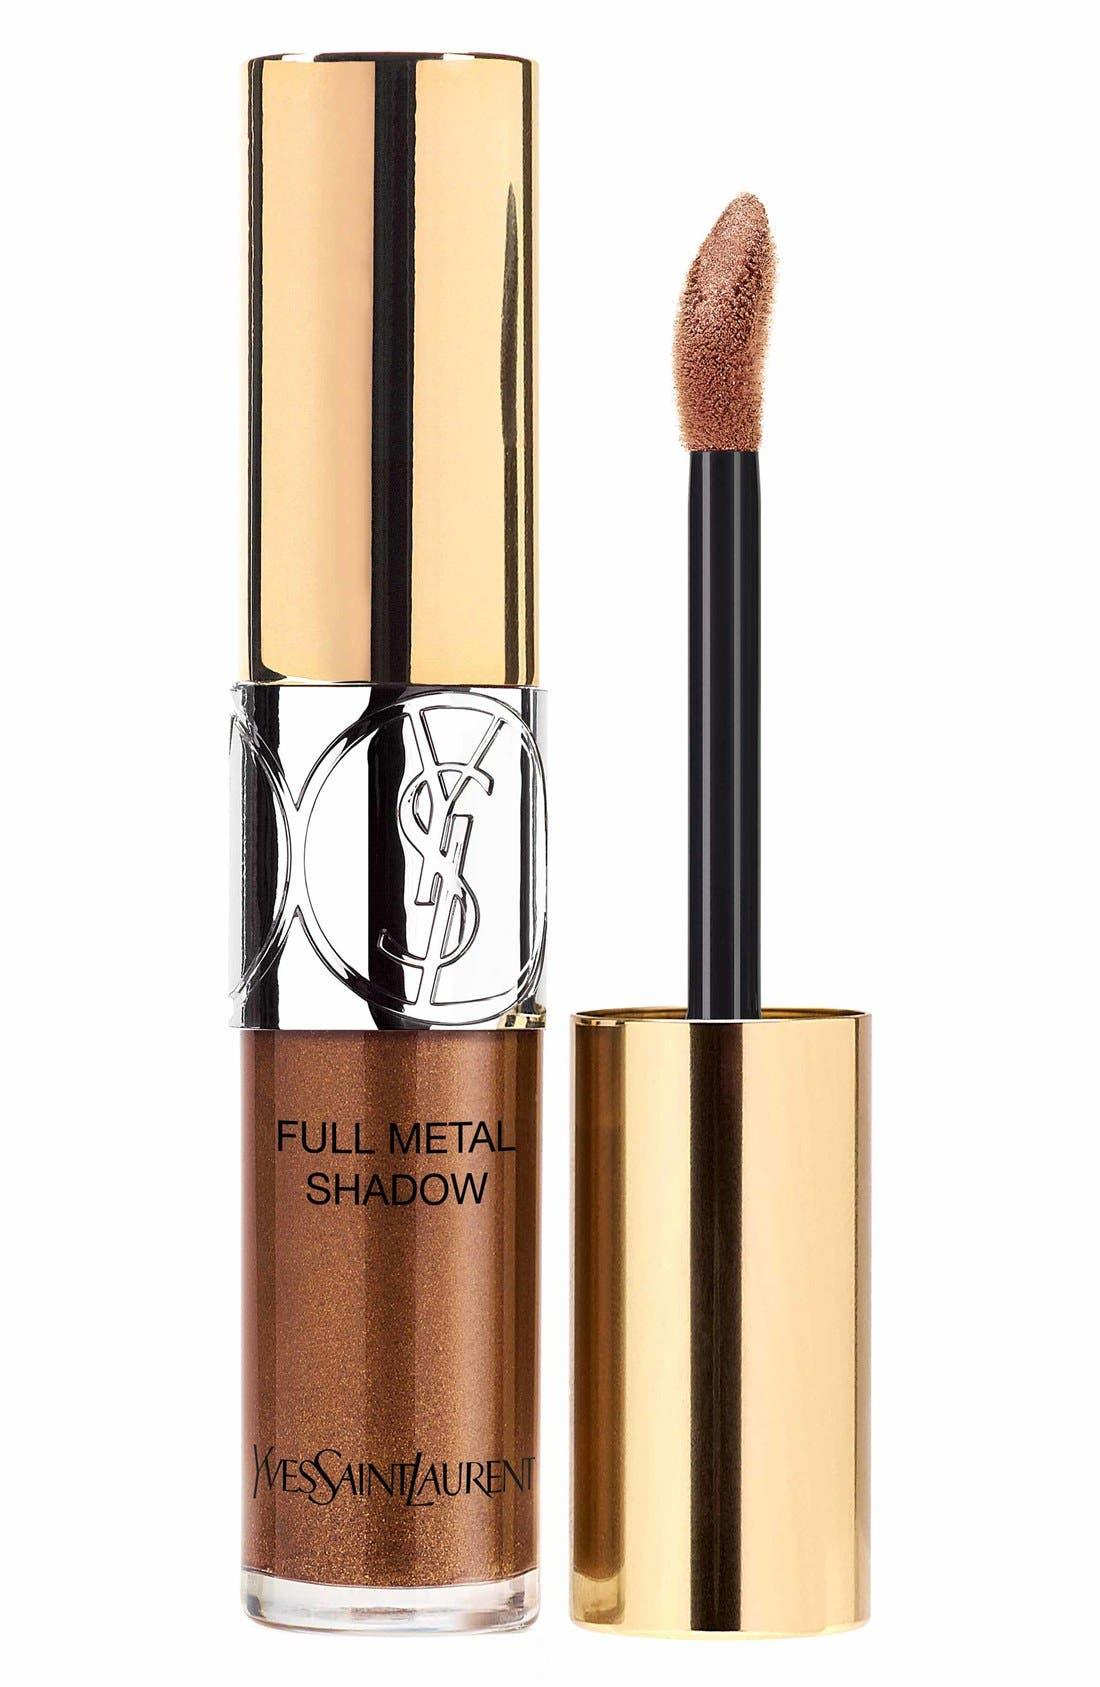 Yves Saint Laurent 'Pop Water - Full Metal Shadow' Metallic Color Liquid Eyeshadow